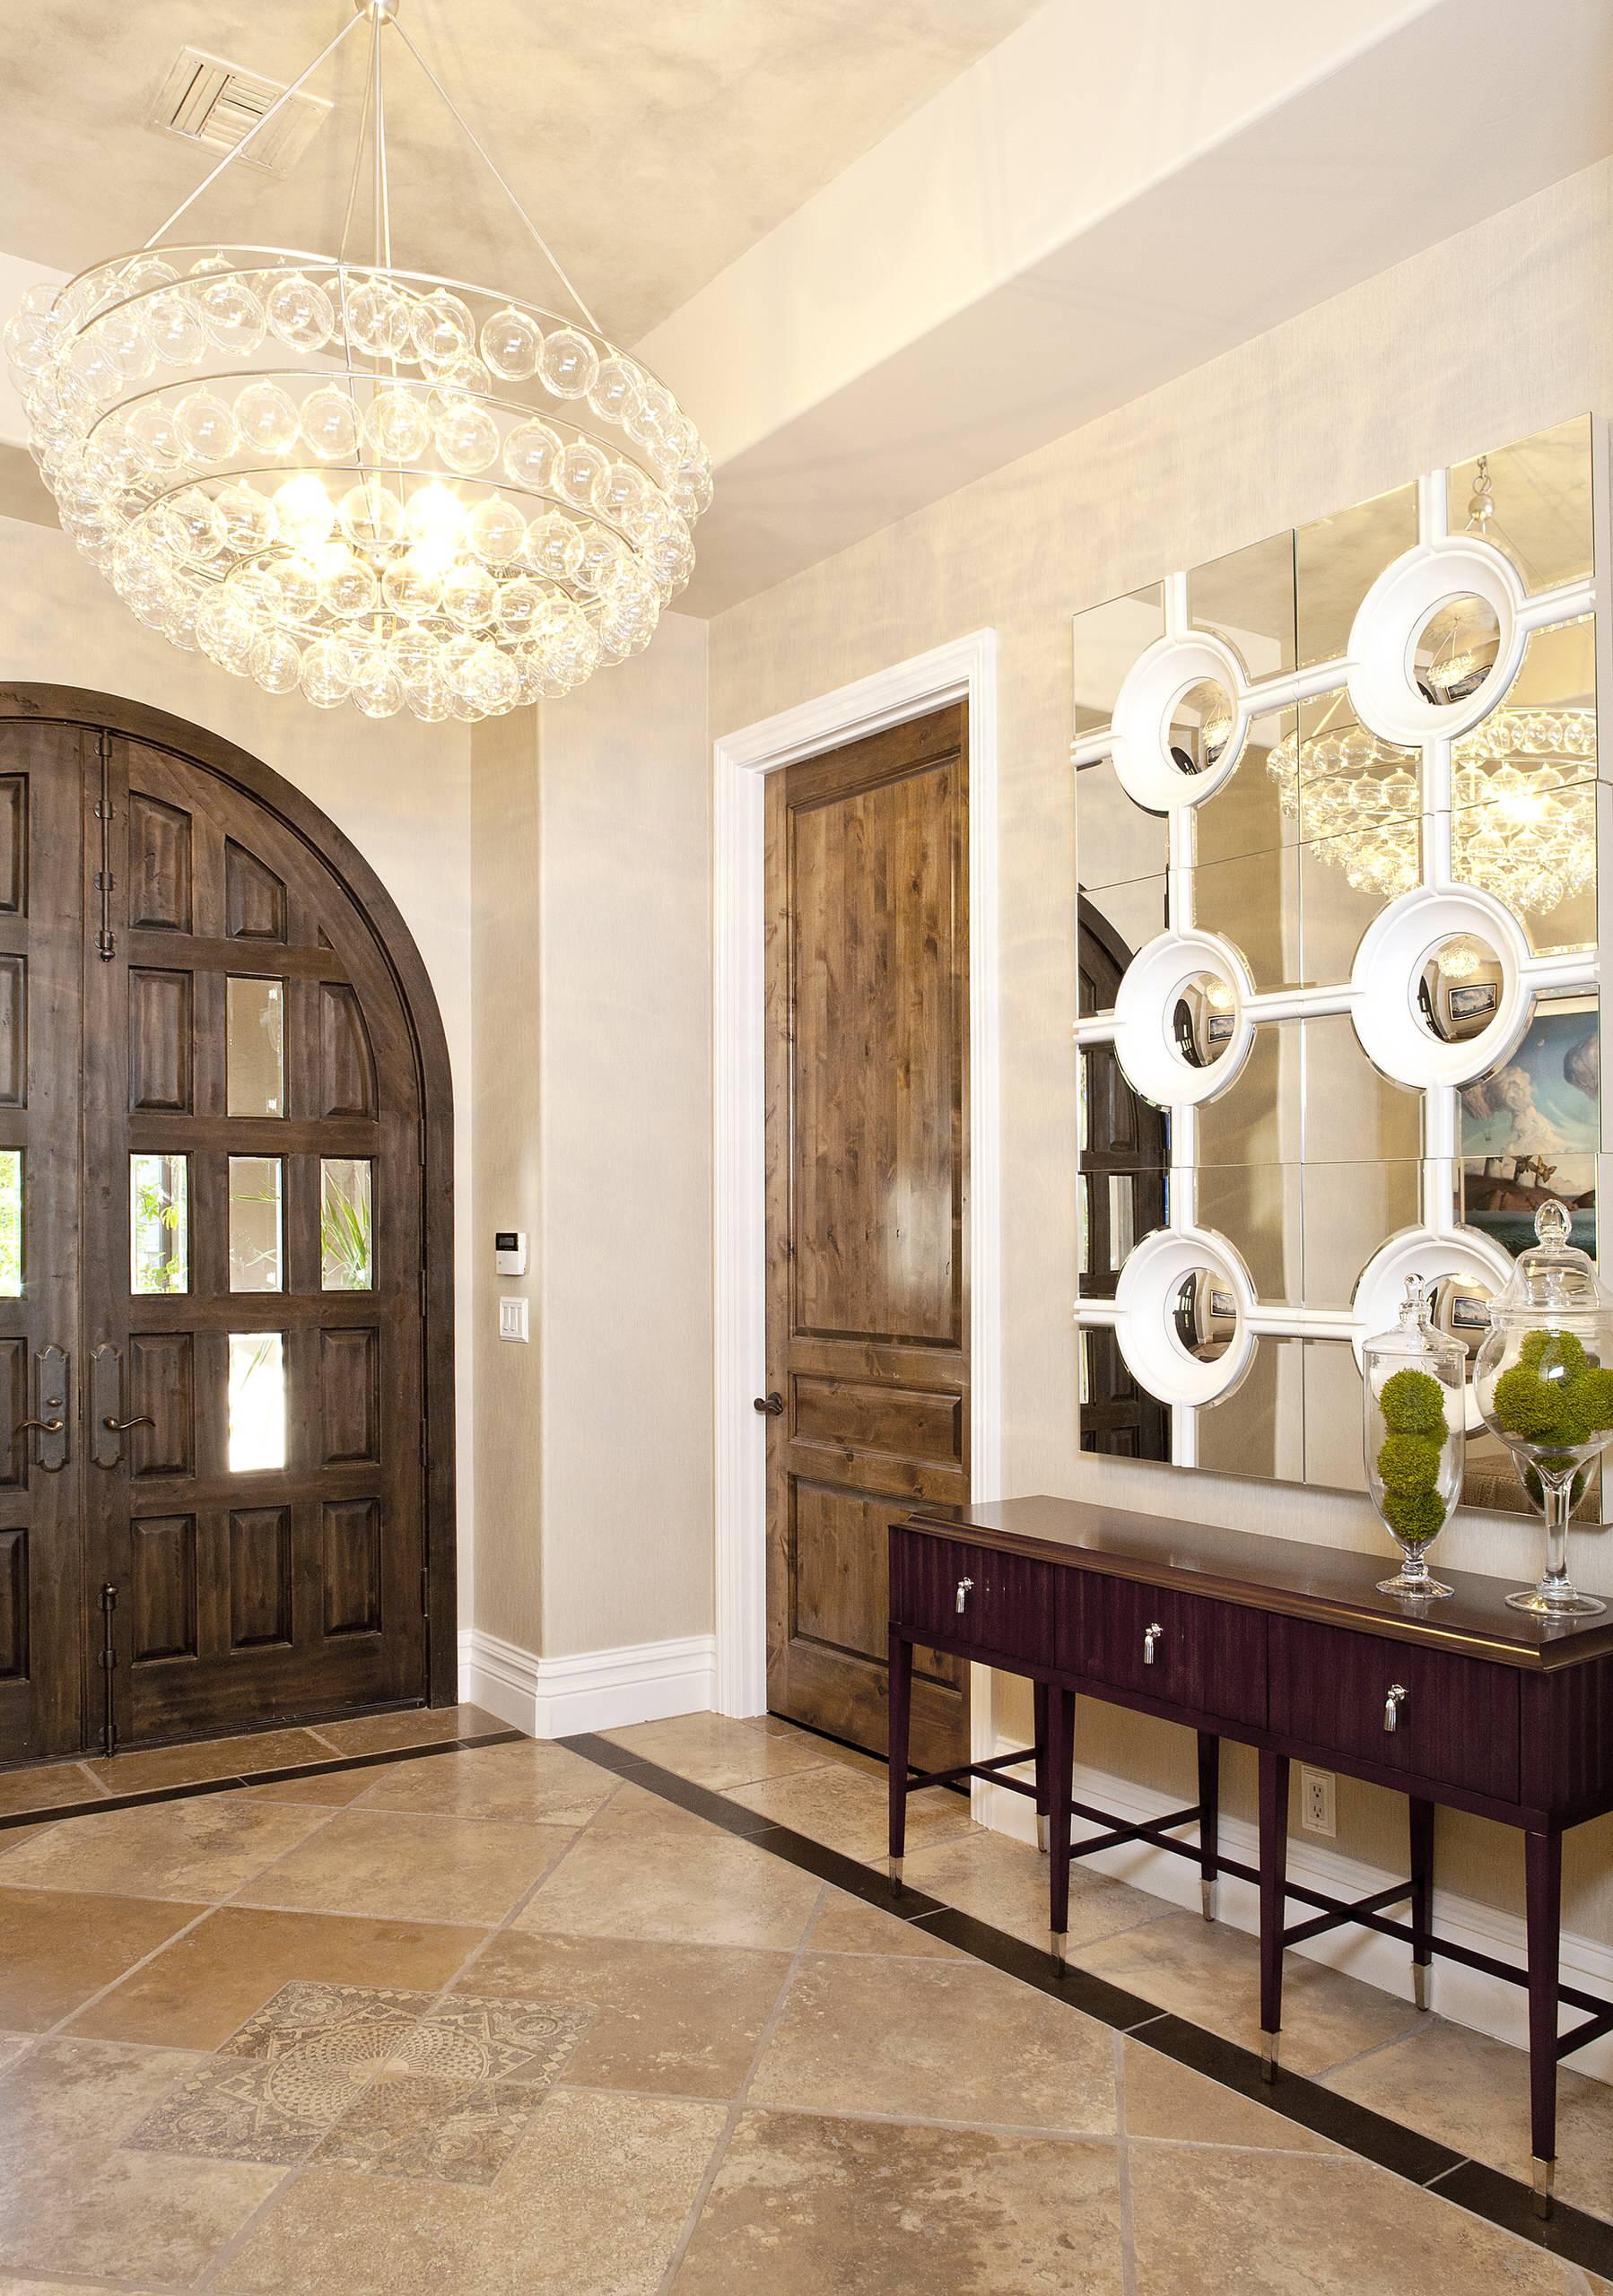 75 Beautiful Marble Floor Foyer Pictures Ideas December 2020 Houzz